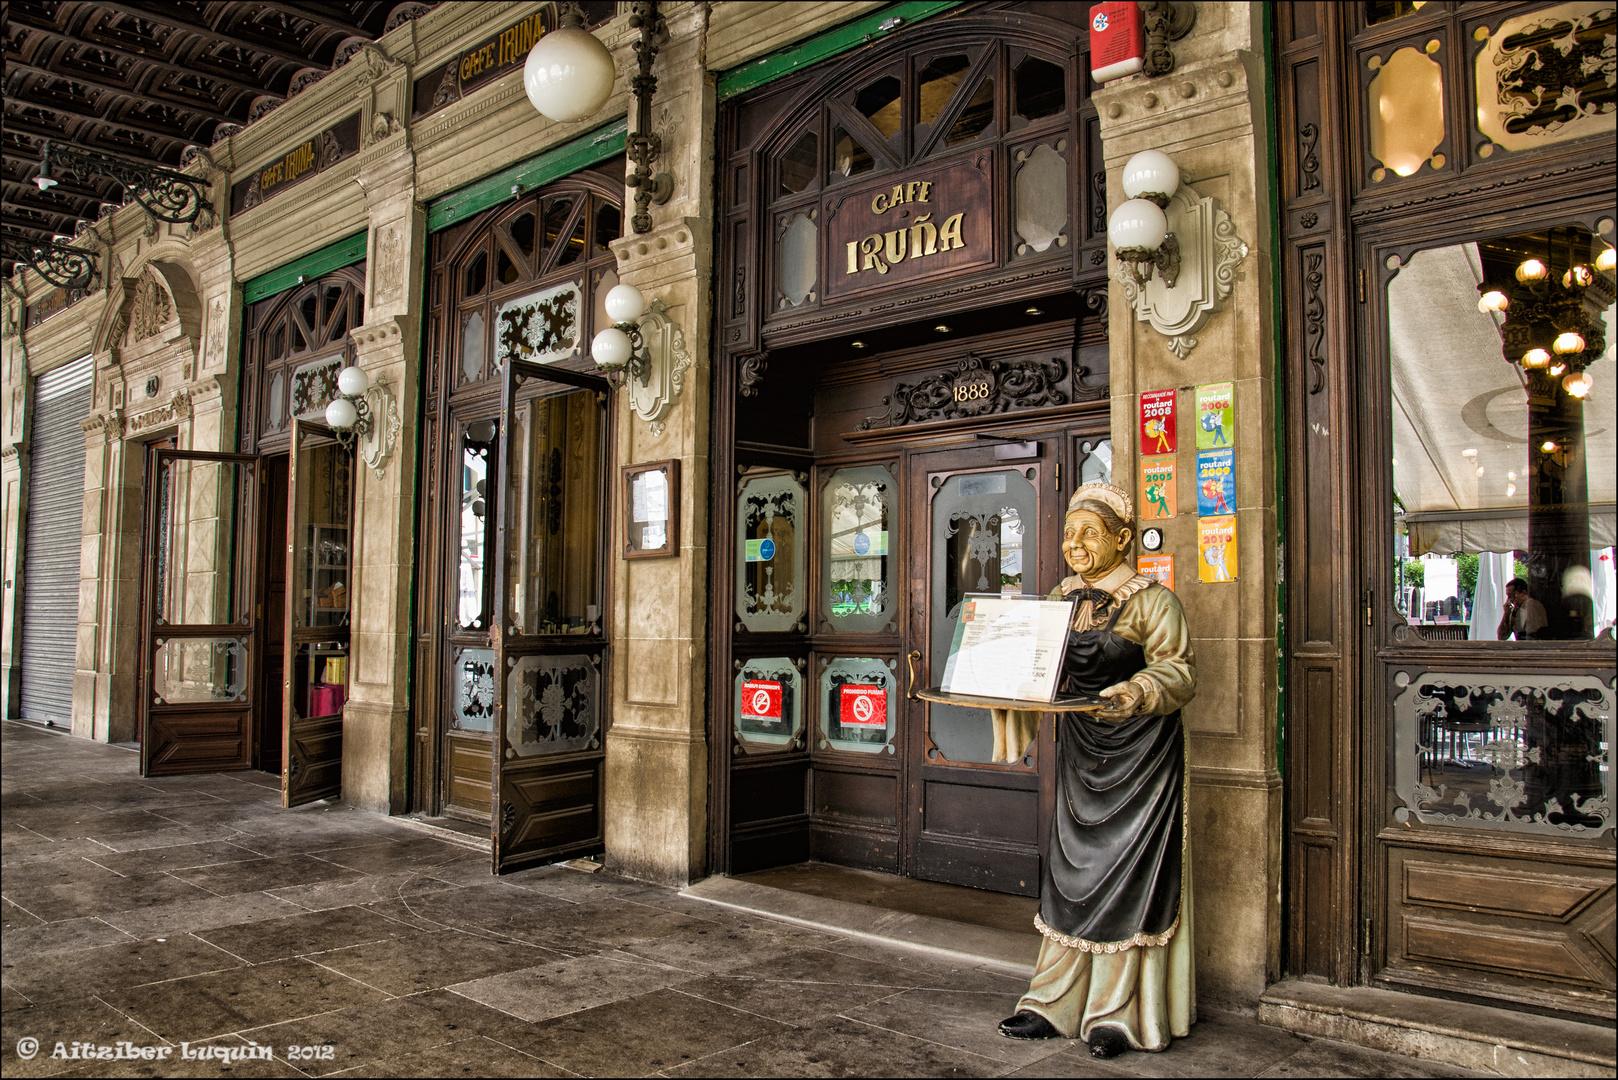 El Café Iruña (Pamplona)